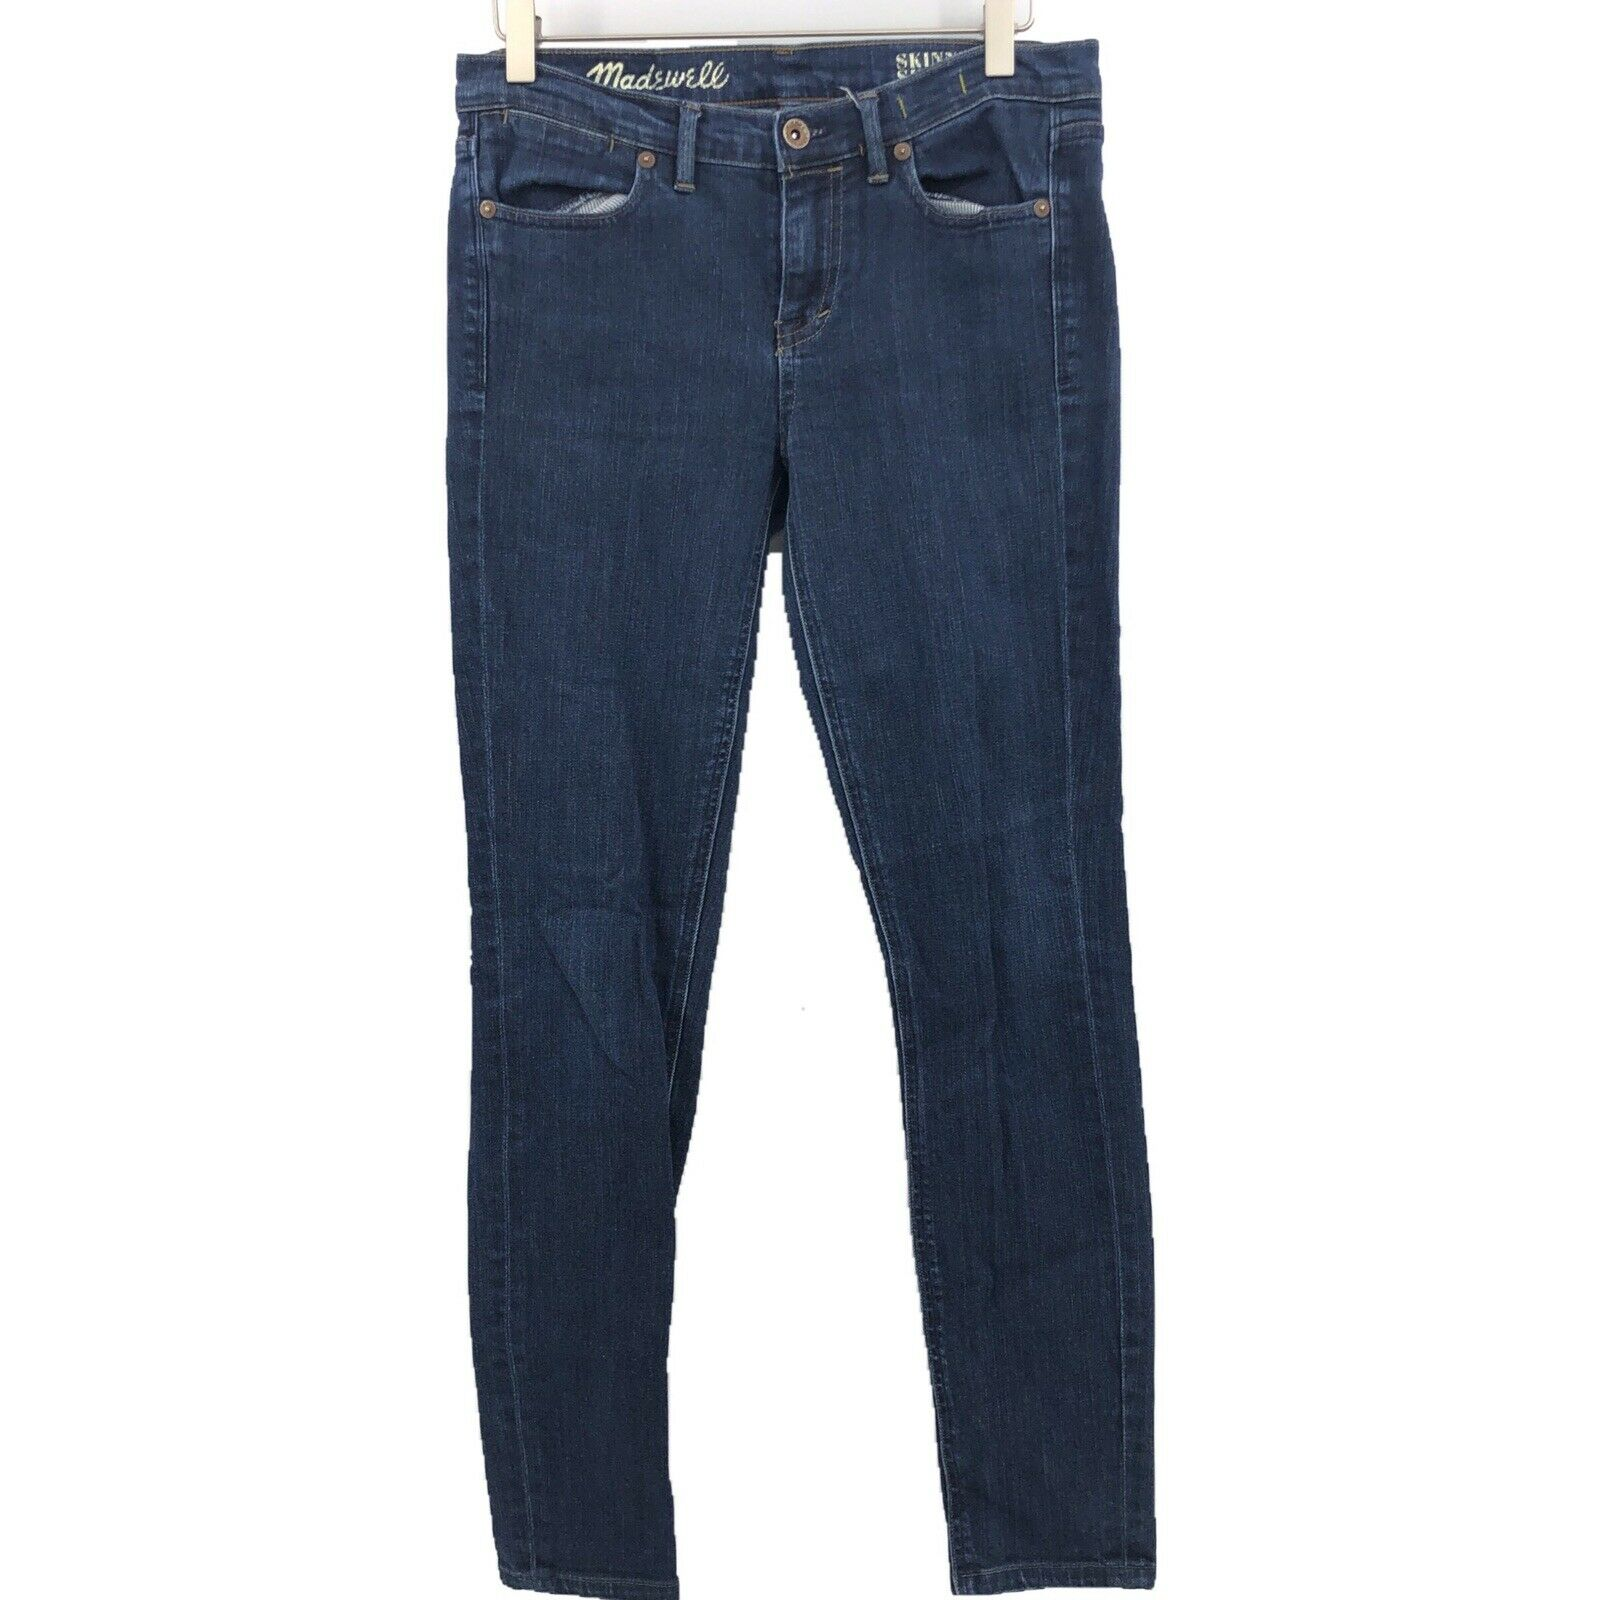 MADEWELL Womens bluee High Rise Skinny Skinny Jeans Stretch Denim 27 X 28 Ankle